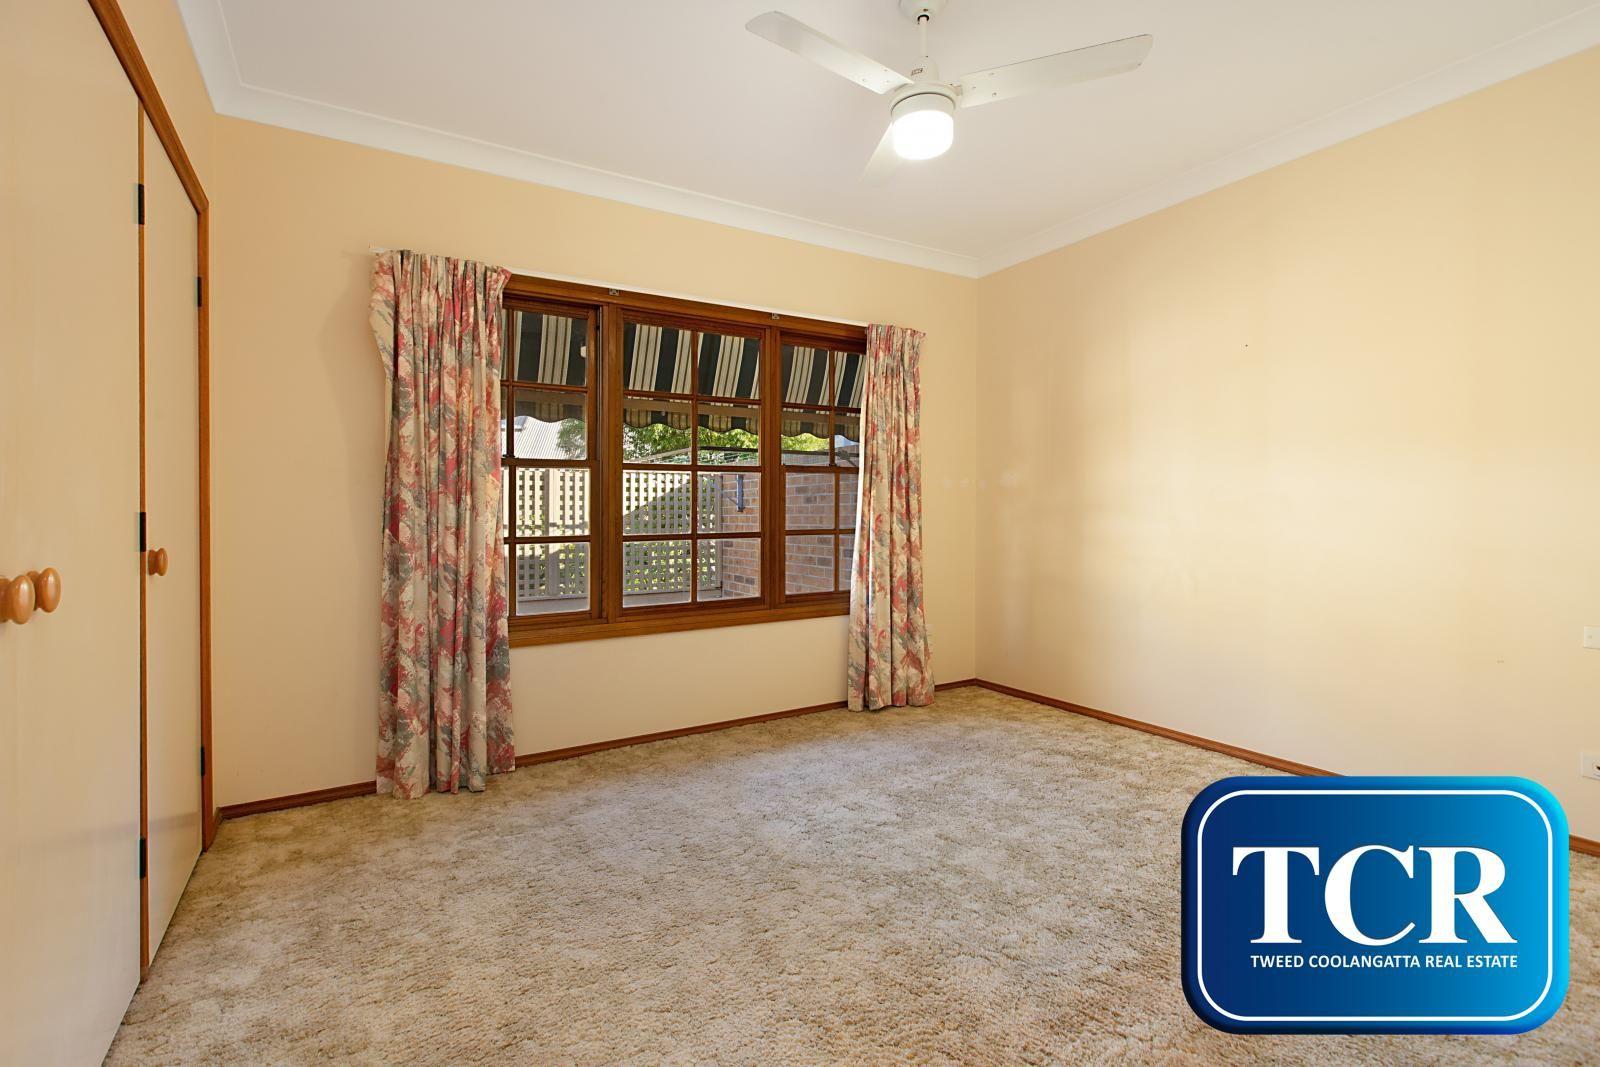 39/1 Carramar Drive, Tweed Heads West NSW 2485, Image 2